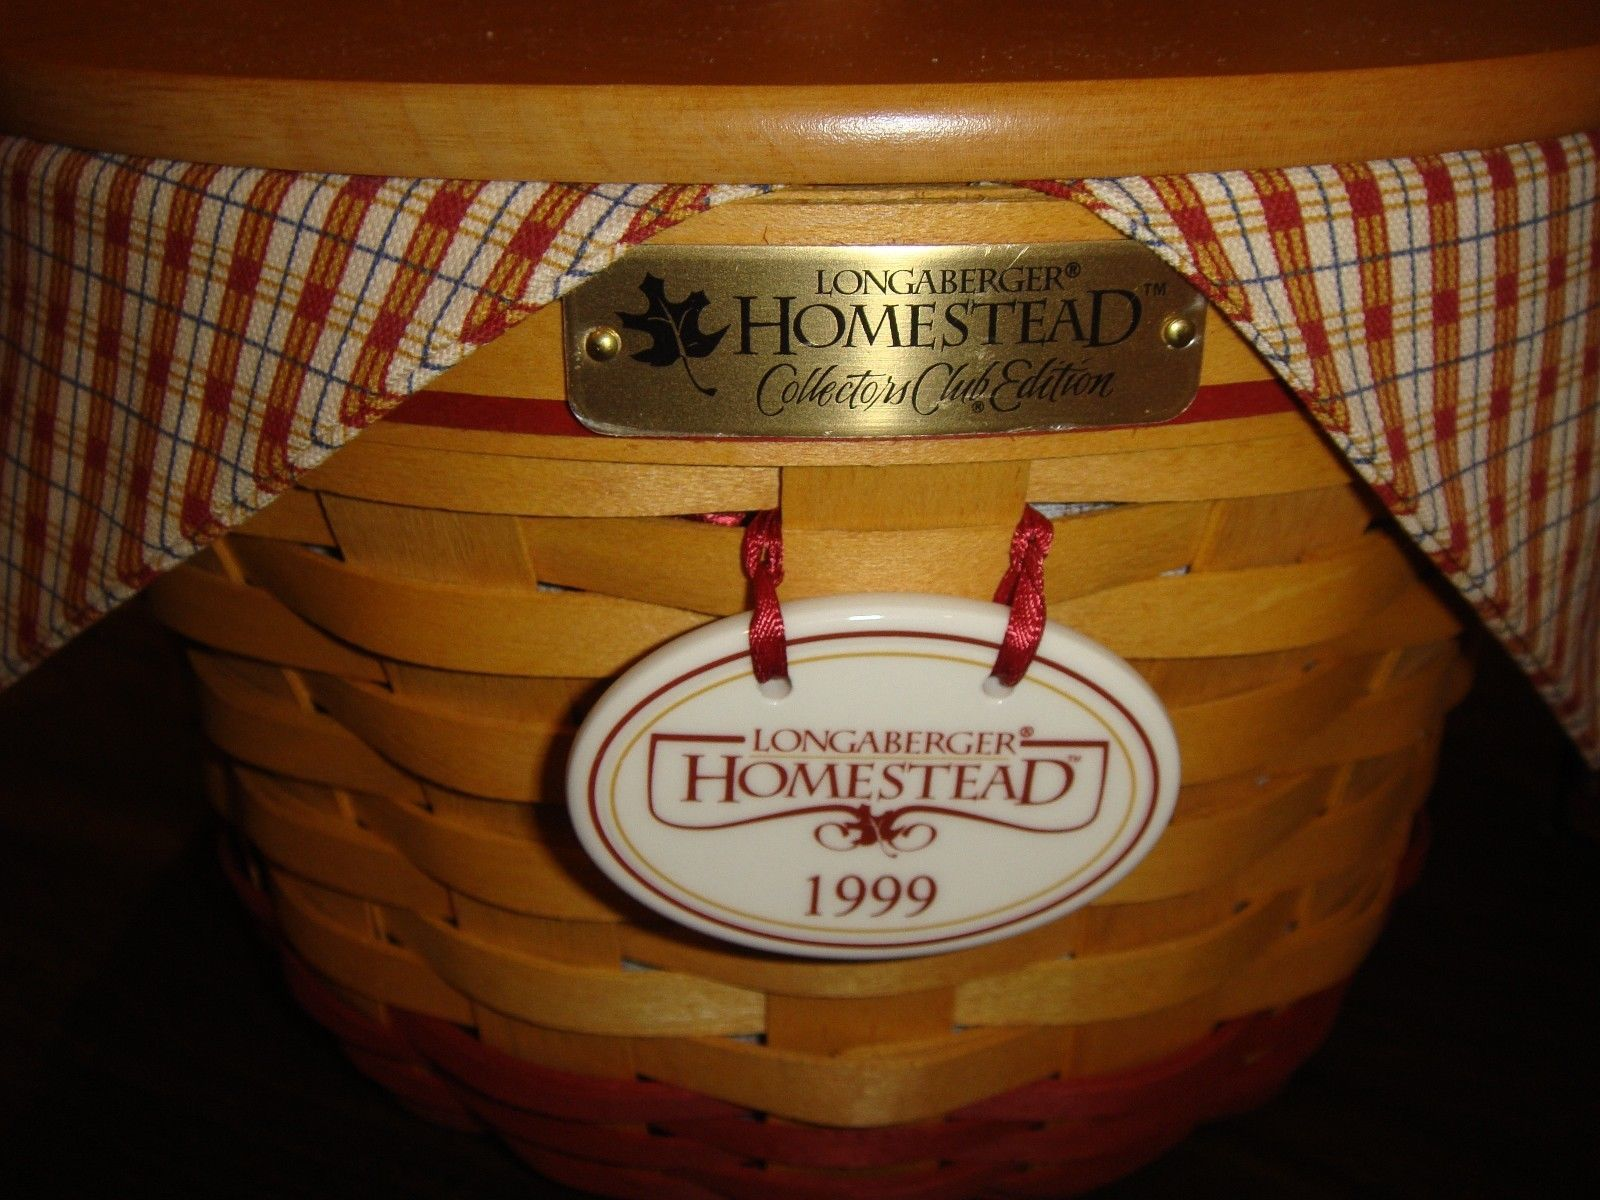 Longaberger 1999 Collectors Club Homestead Basket Combo